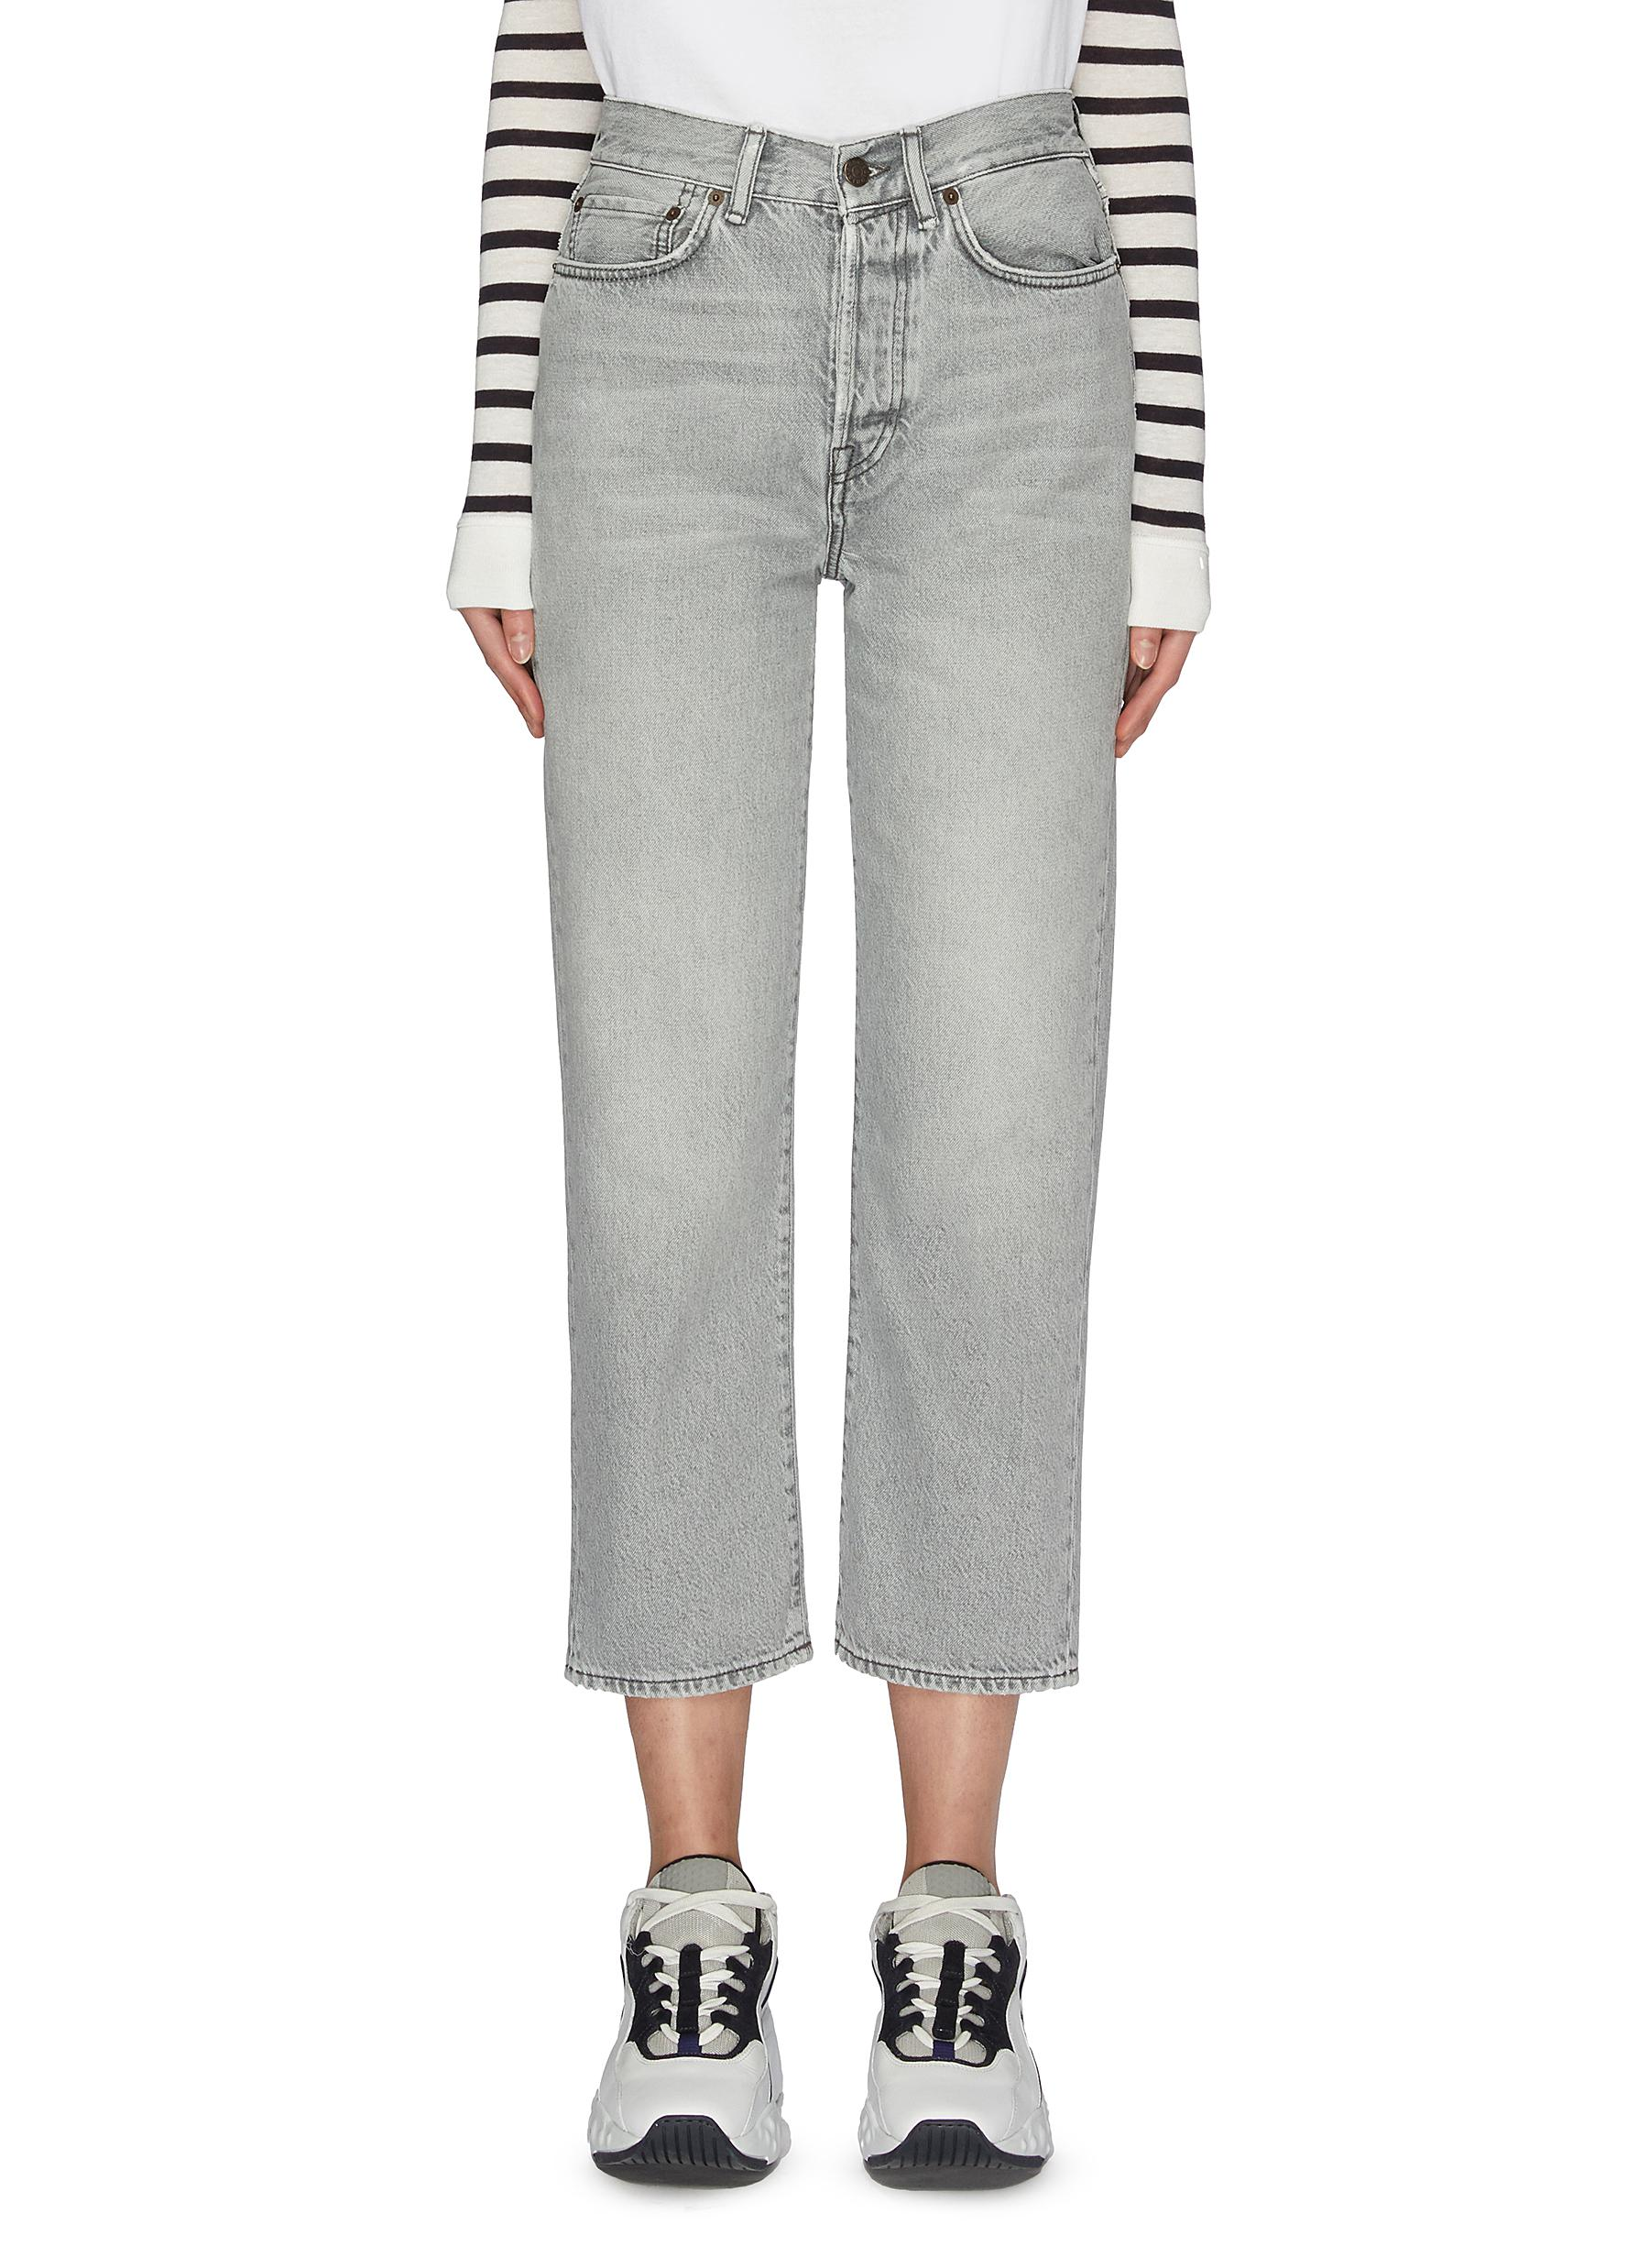 Buy Acne Studios Jeans Stone wash jeans